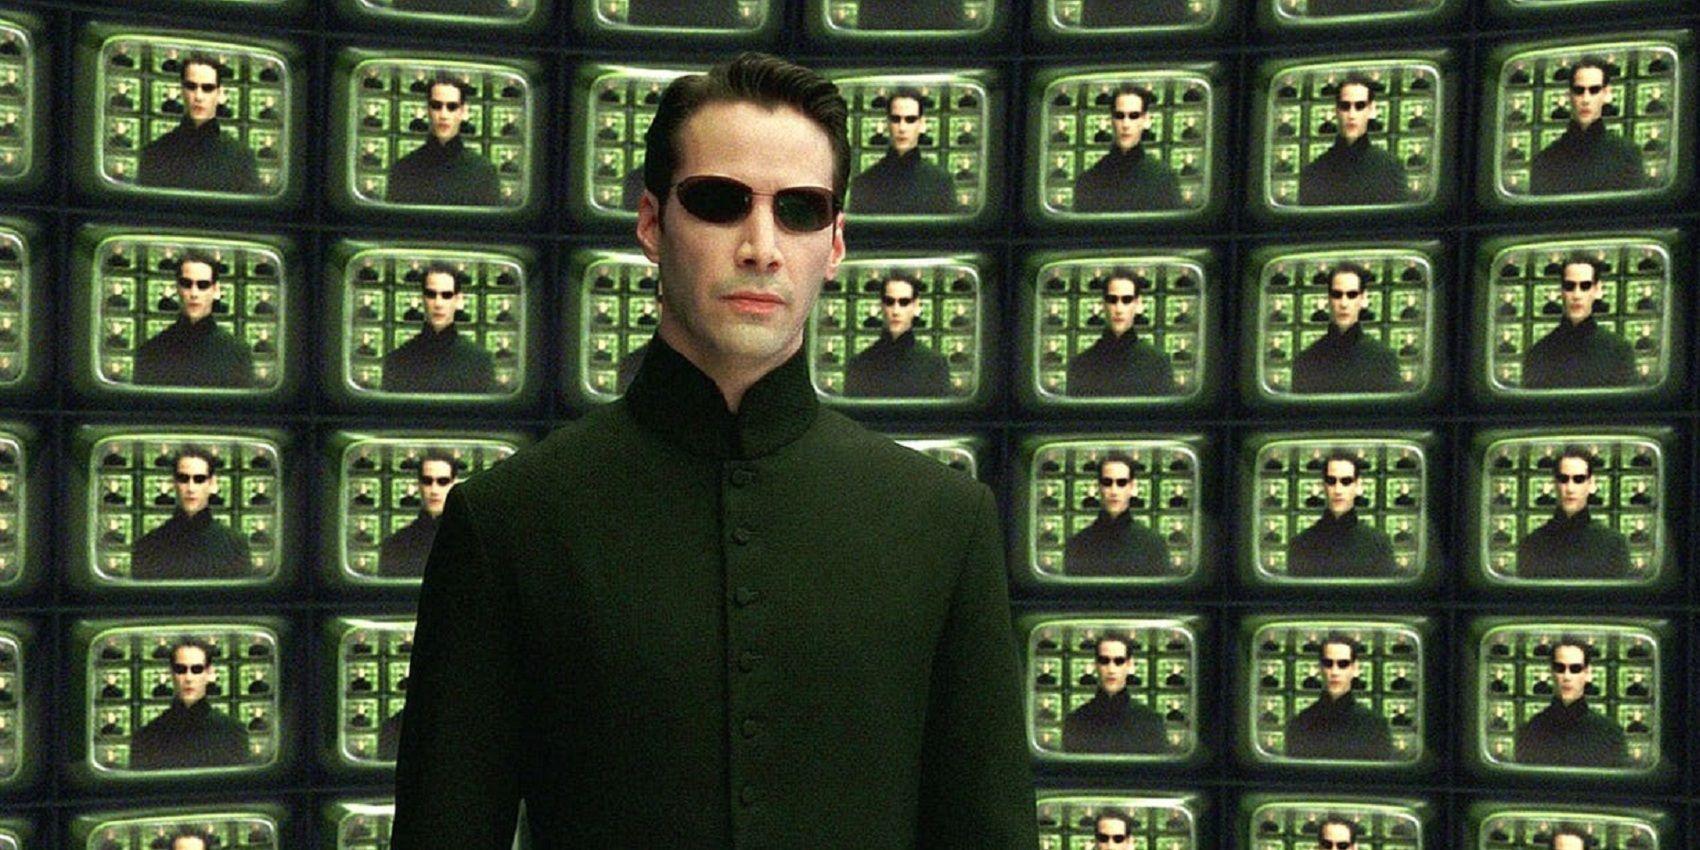 https://static2.srcdn.com/wordpress/wp-content/uploads/2019/08/Matrix-Neo-talking-to-the-architect-2.jpg